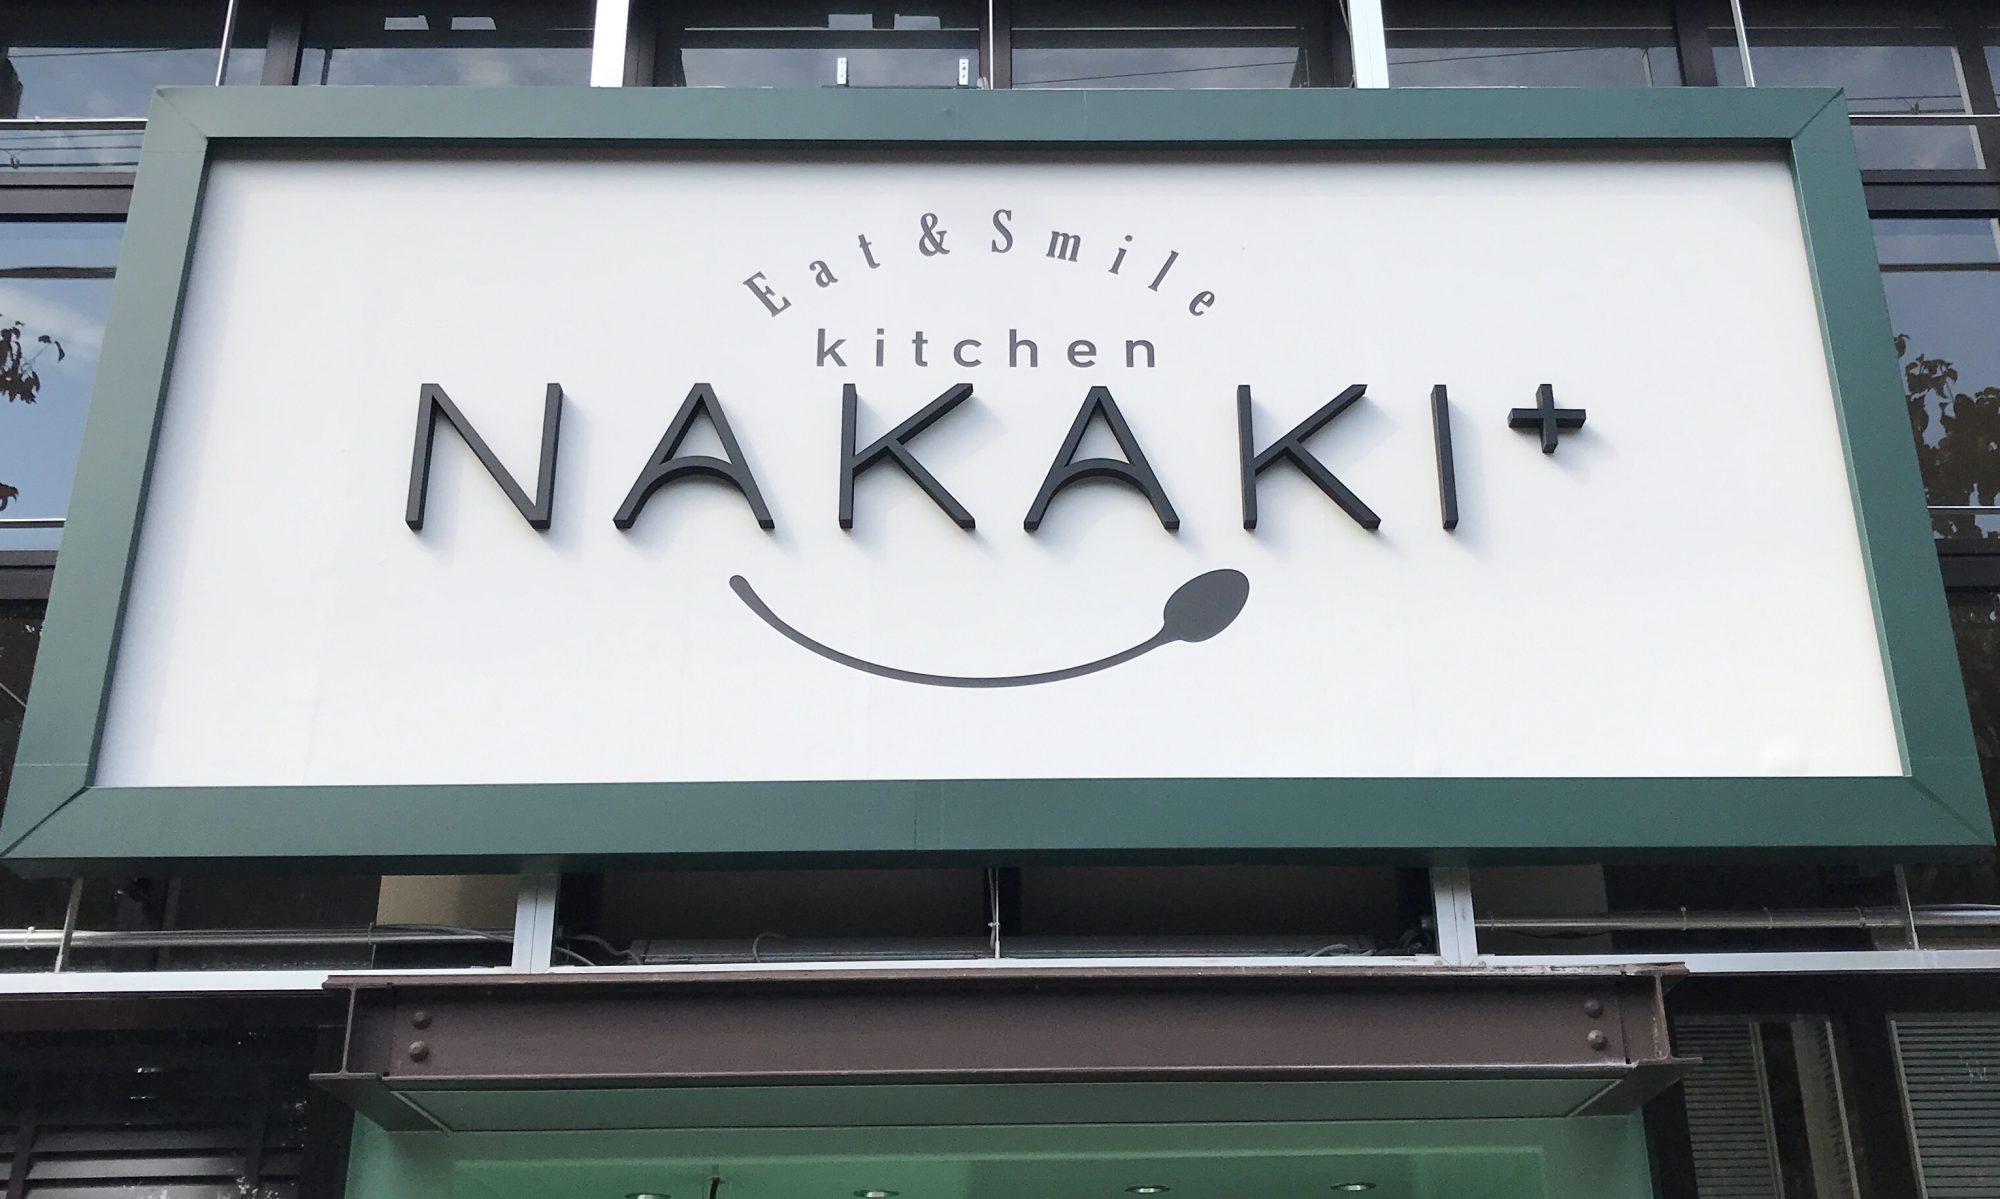 Eat & Smile kitchen NAKAKI+ Blog